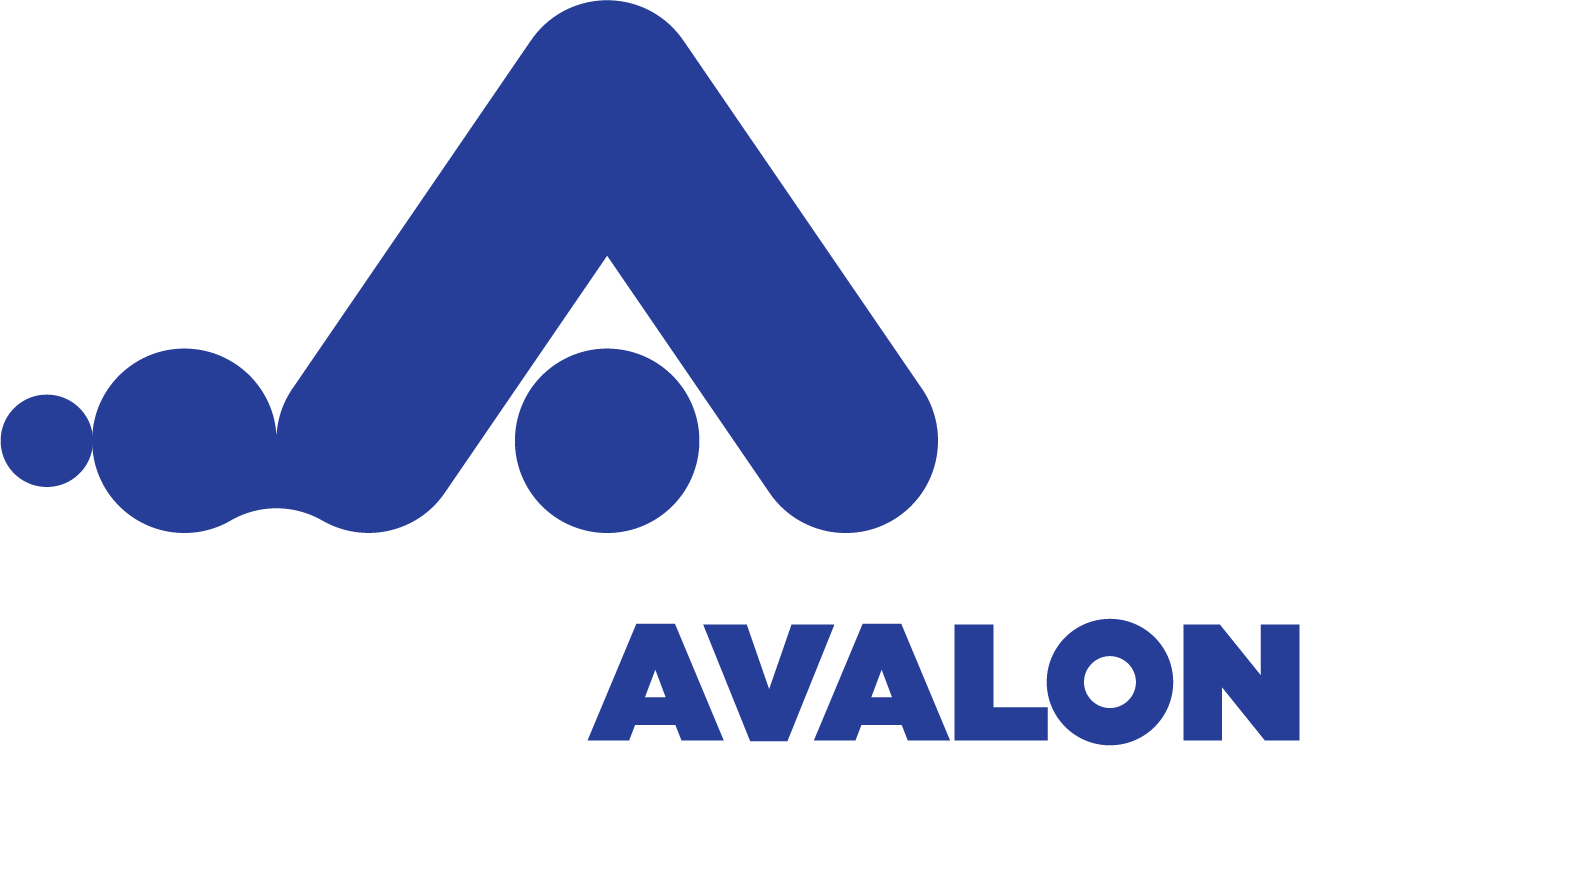 ЖК Avalon Holiday